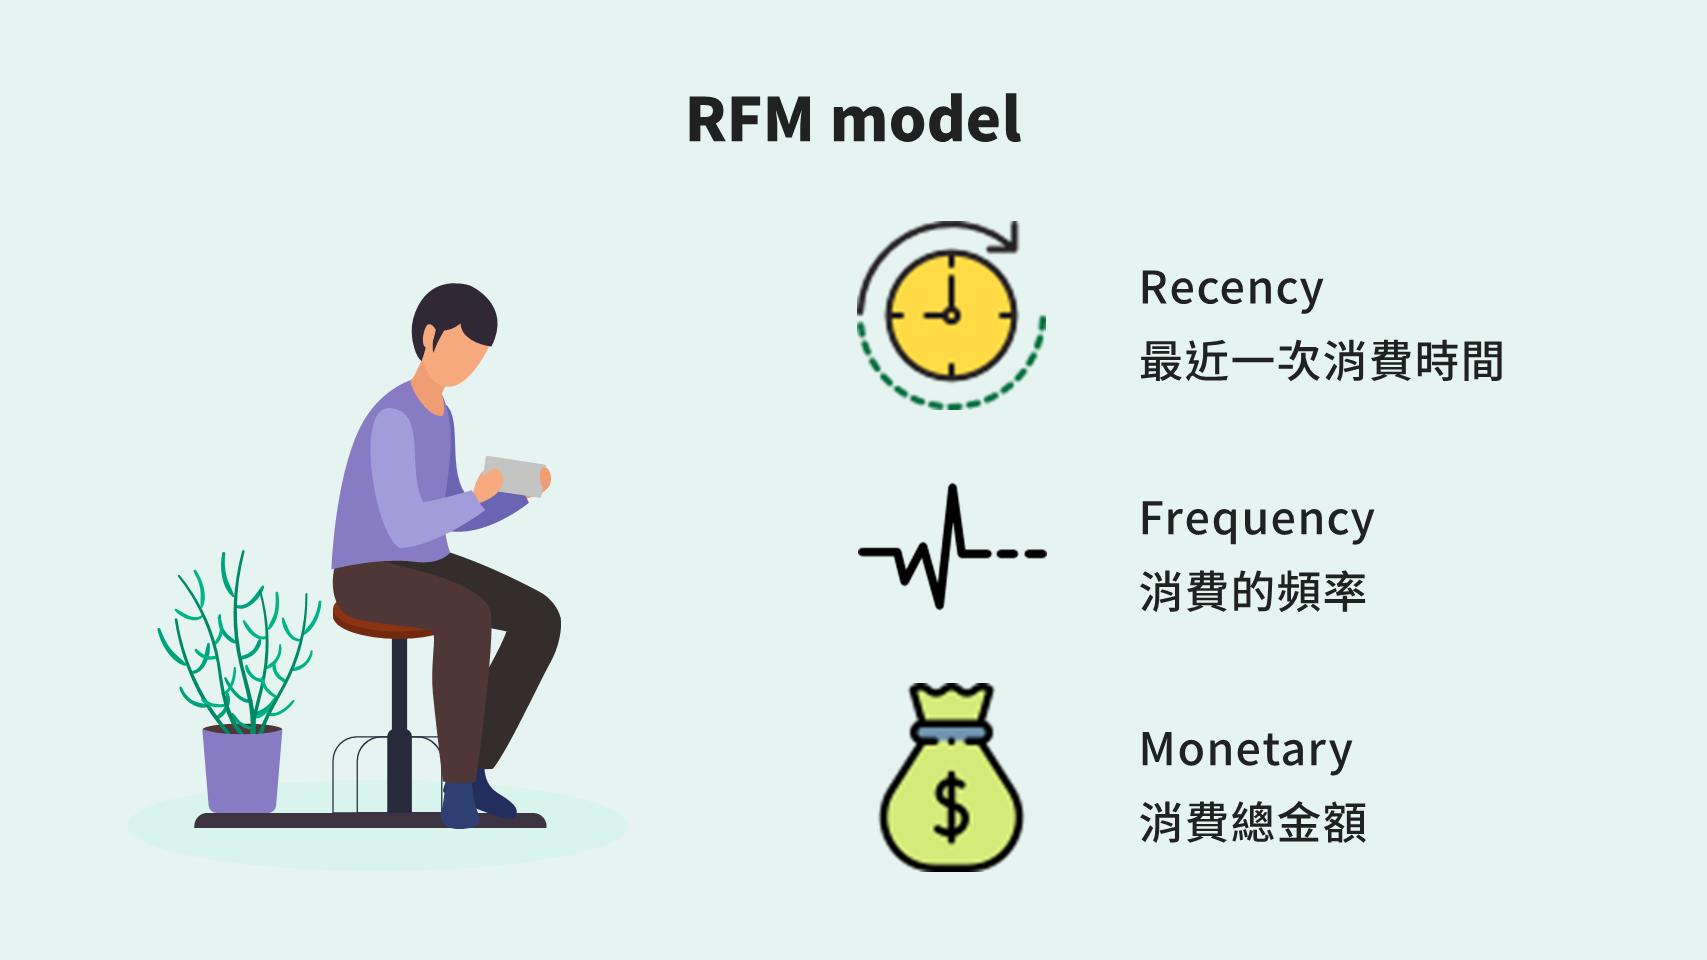 RFM model